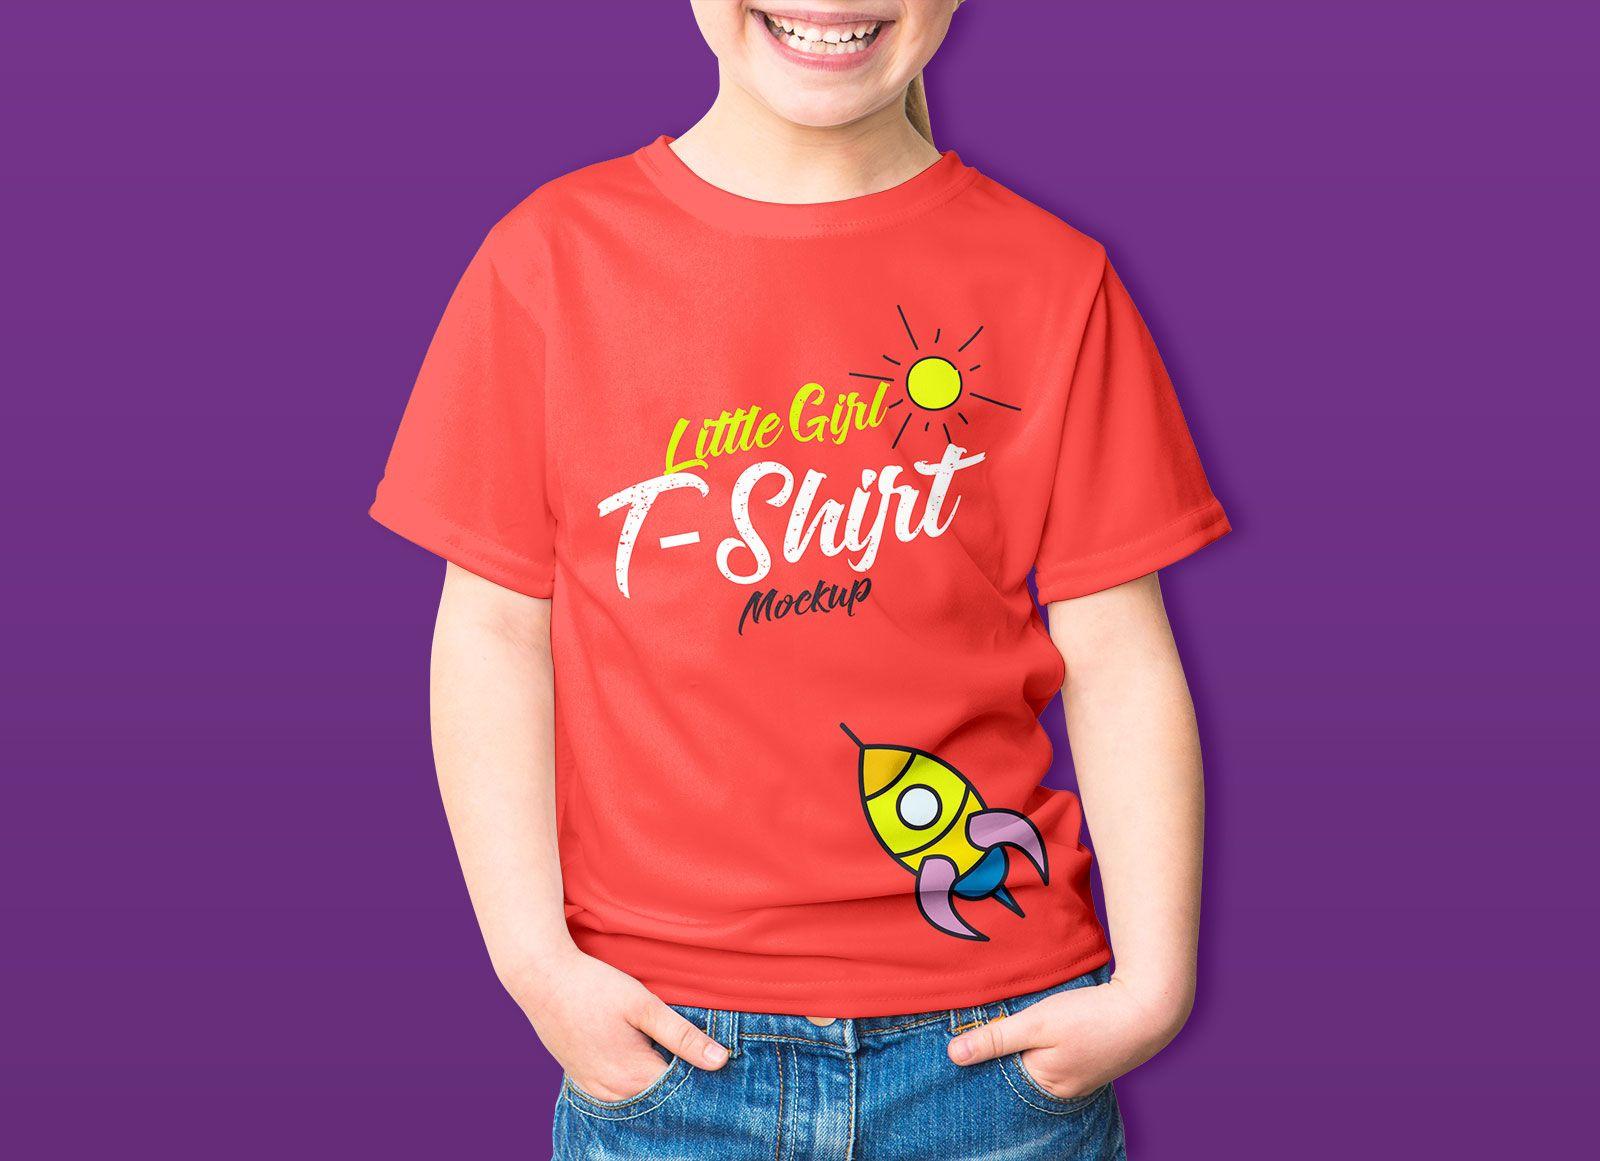 Download Free Little Girl Kids T Shirt Mockup Psd Shirt Mockup Girls Tshirts Tshirt Mockup